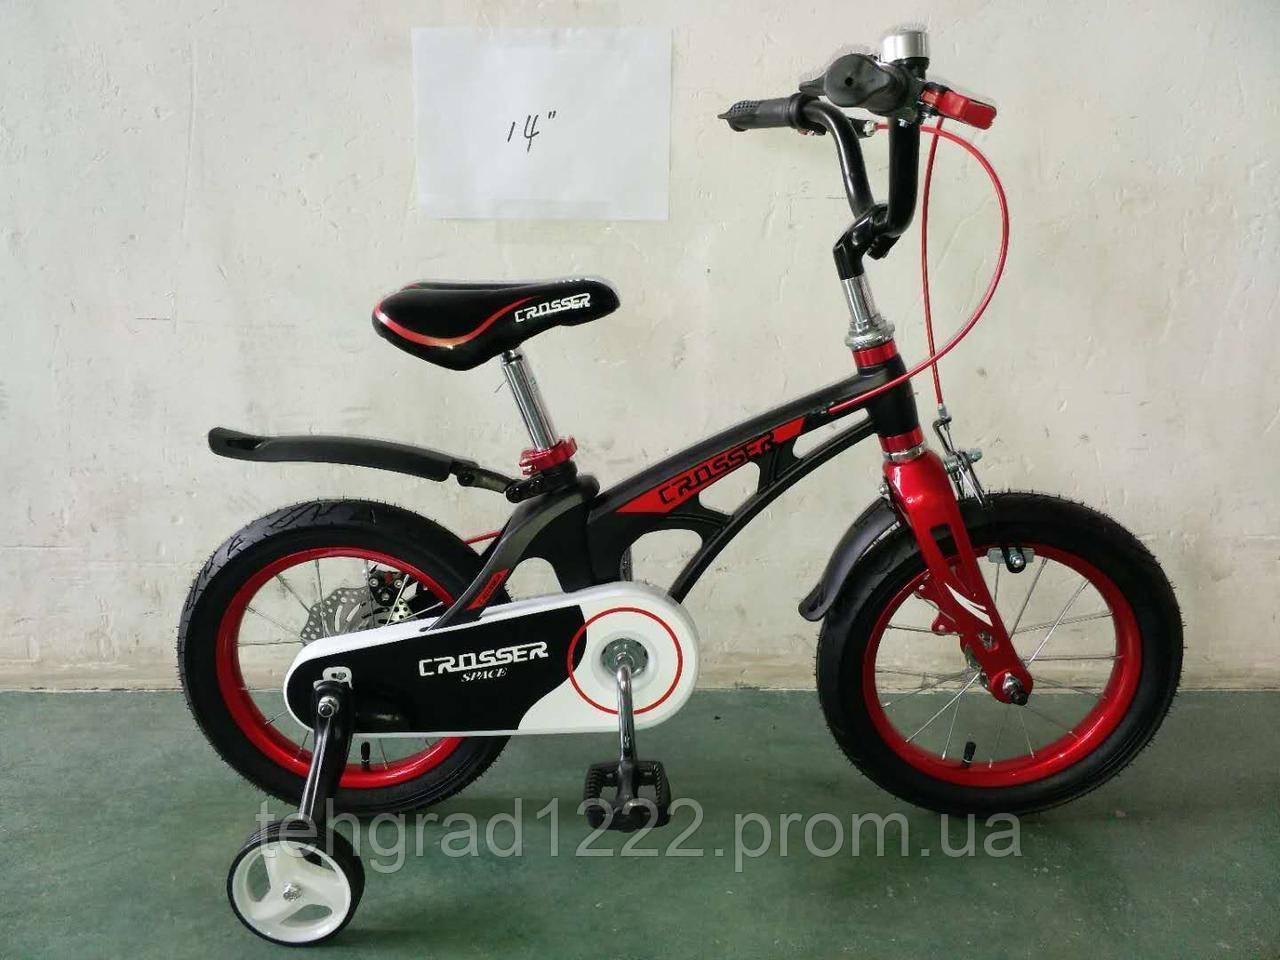 "Lетский велосипед колеса 20 дюймів Crosser Space 20"""